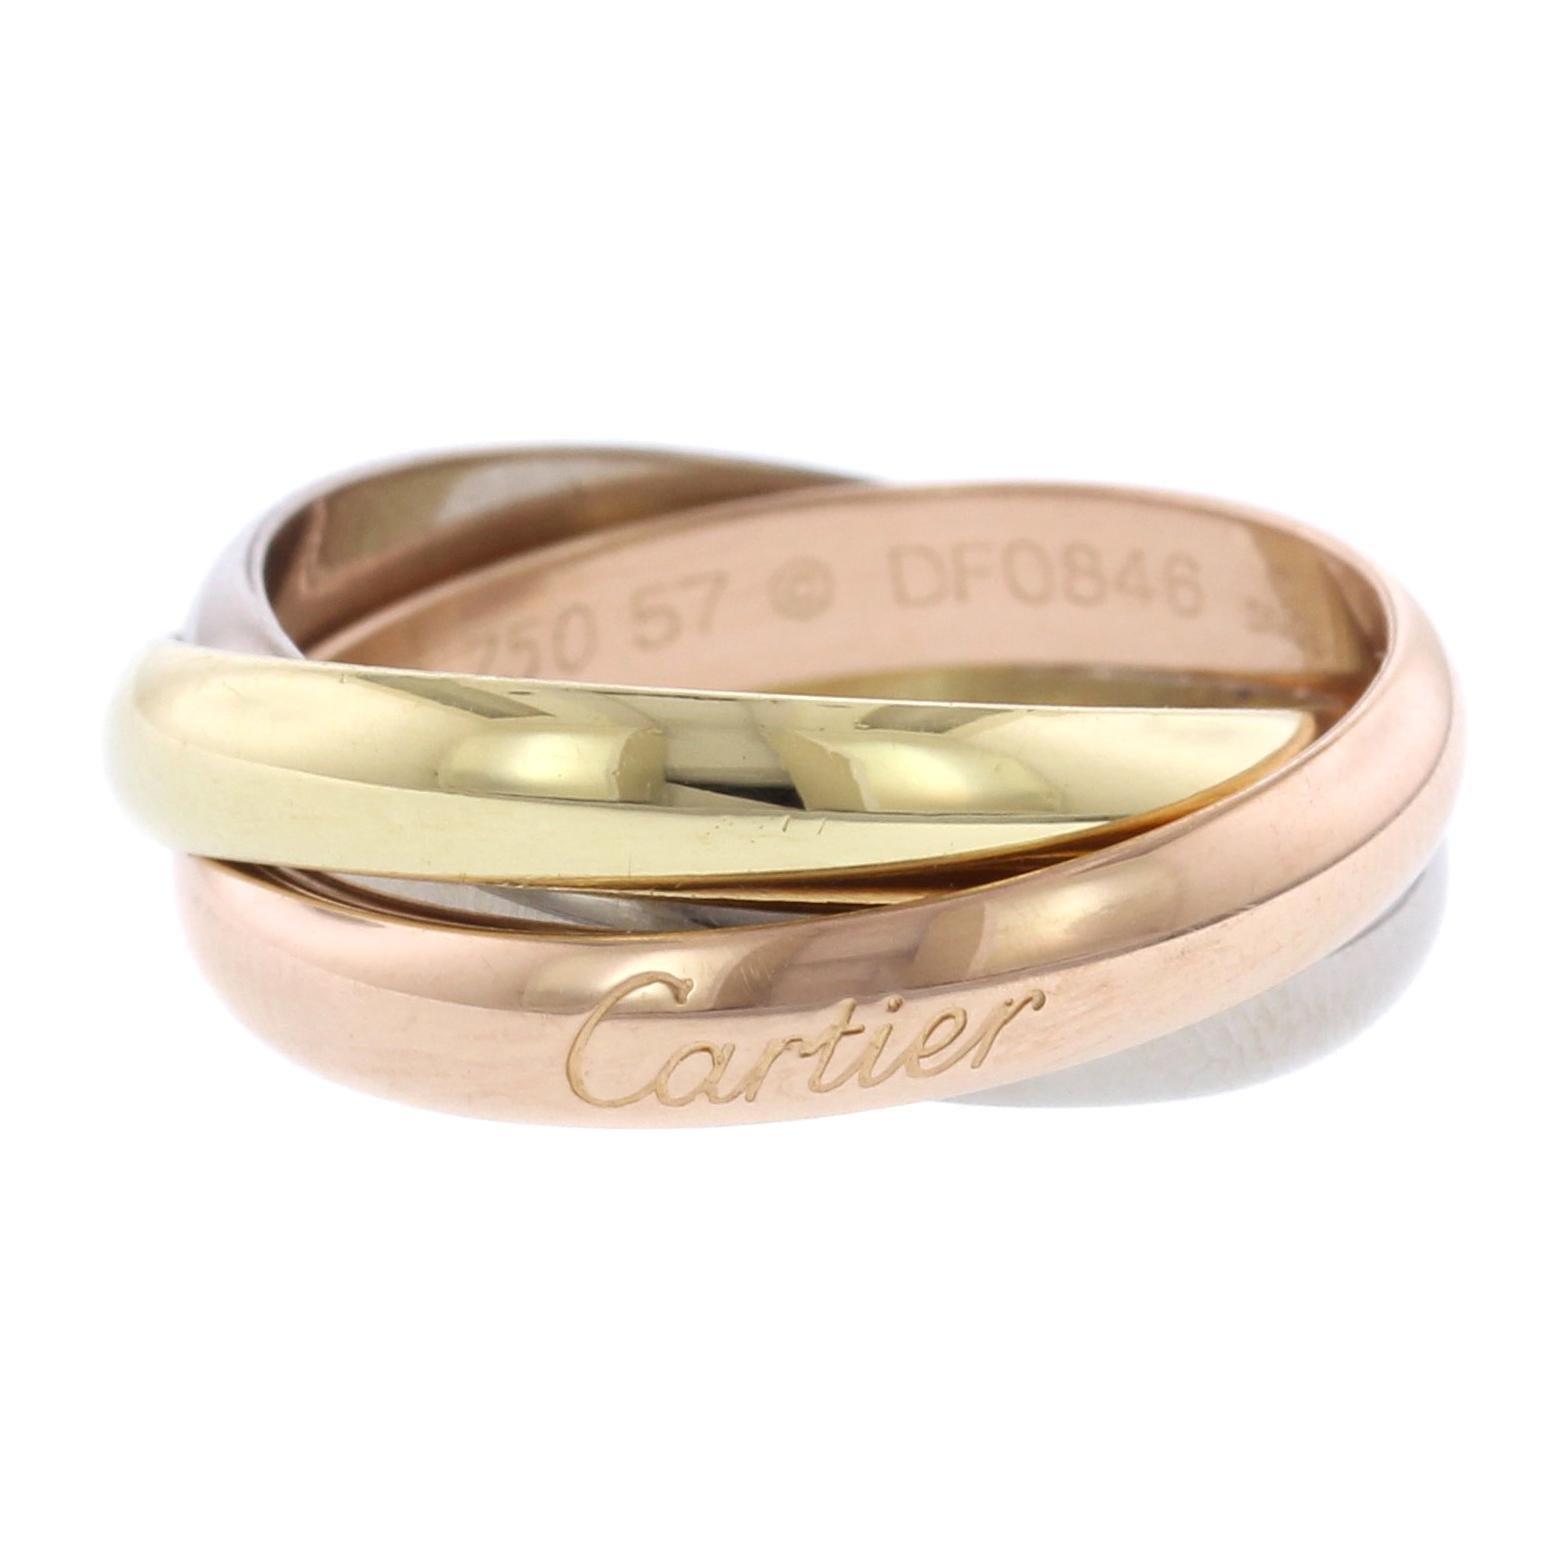 ed480cb3b9e7d Cartier 18 Karat Tricolor Gold Trinity Rolling Ring